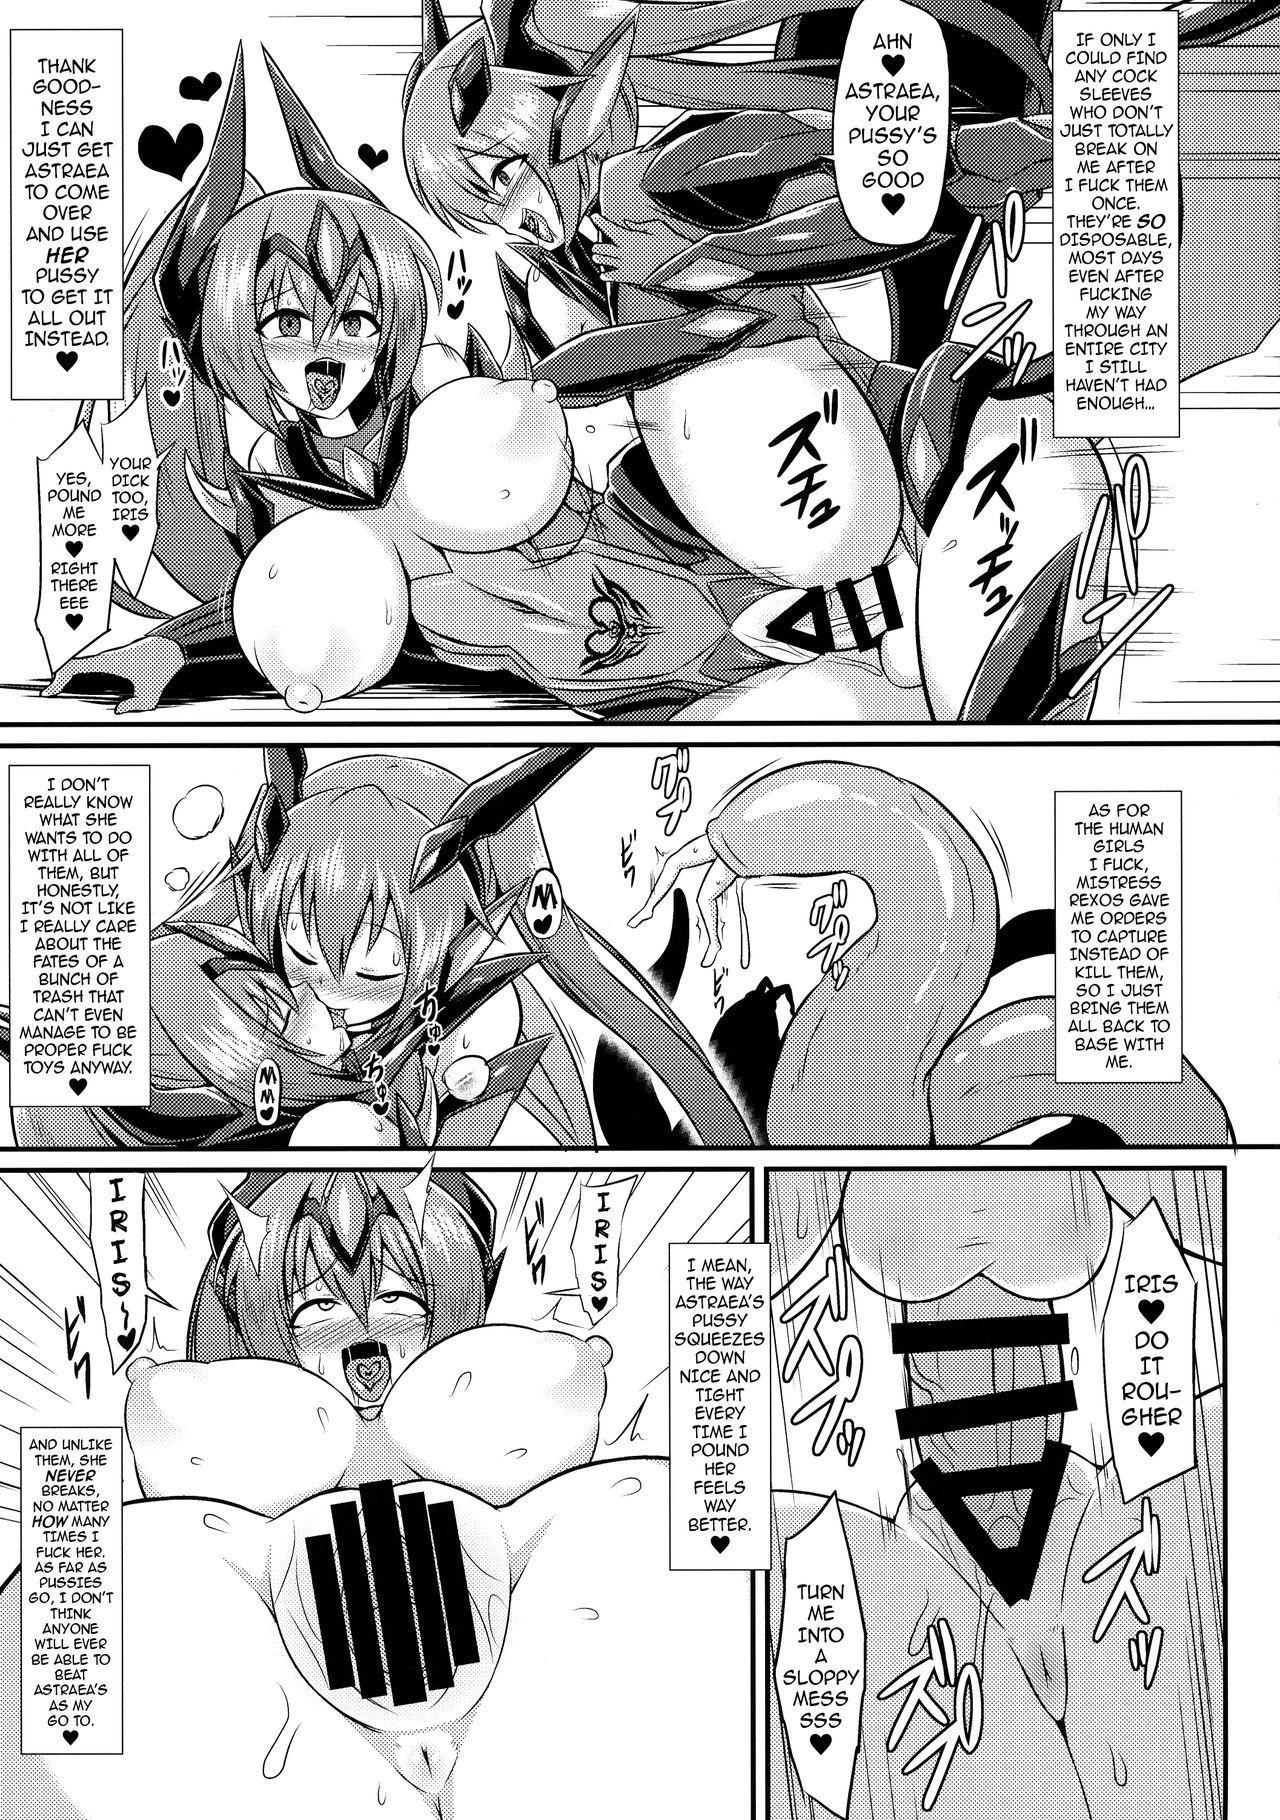 (C94) [Ikameshi Shokudou (Ikameshi)] Seisenki Iris 3 ~Inbinaru Shuuen~ | Battle Angel Iris 3 ~The End of Purity~ [English] {darknight} 12